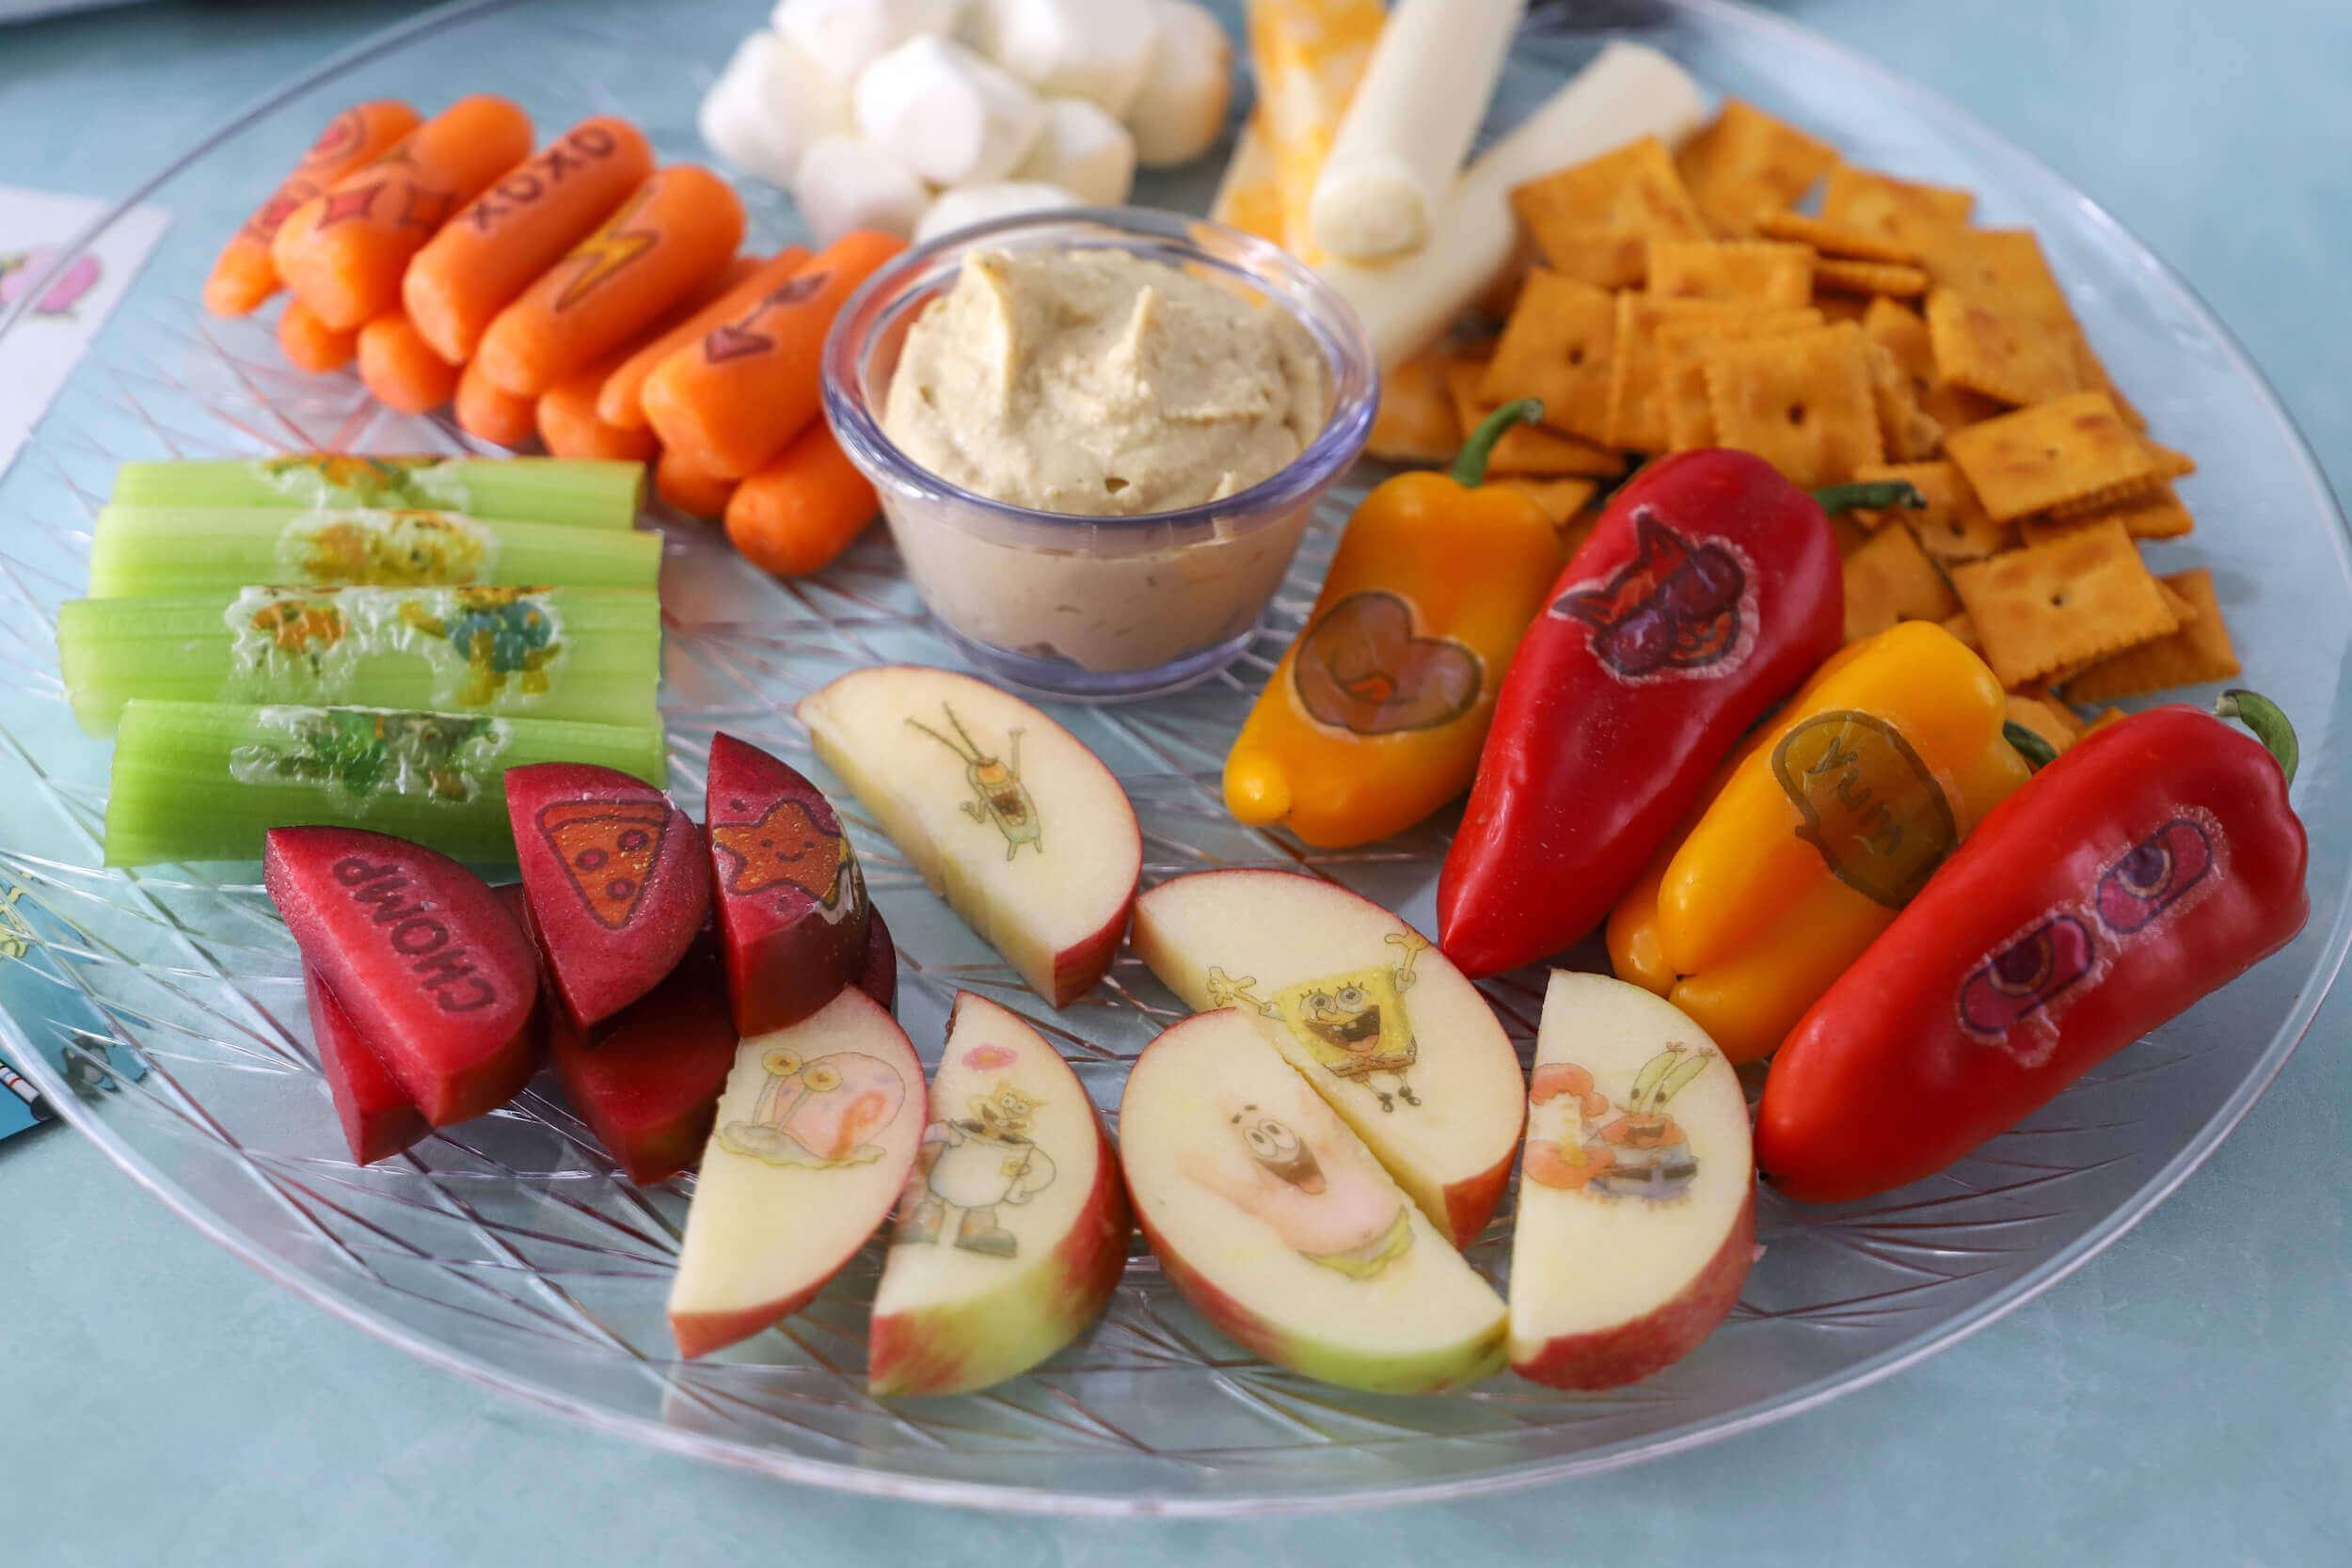 StickyLickits Poolside Snack Tray